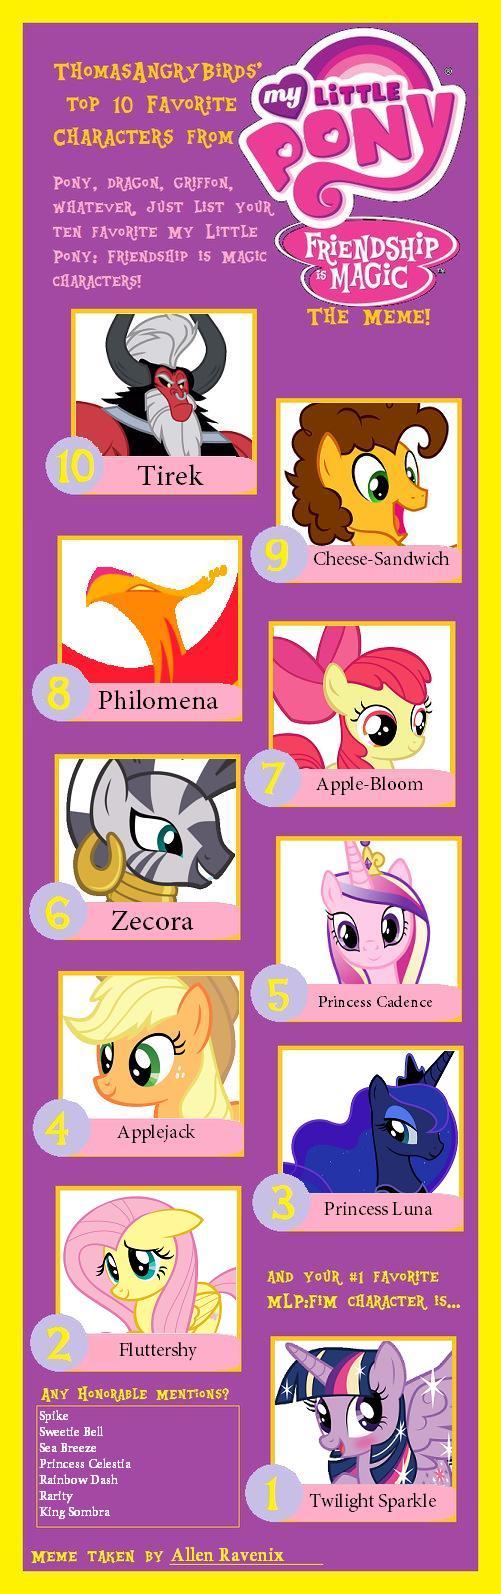 Top 10 My Little Pony Meme by AllenRavenix